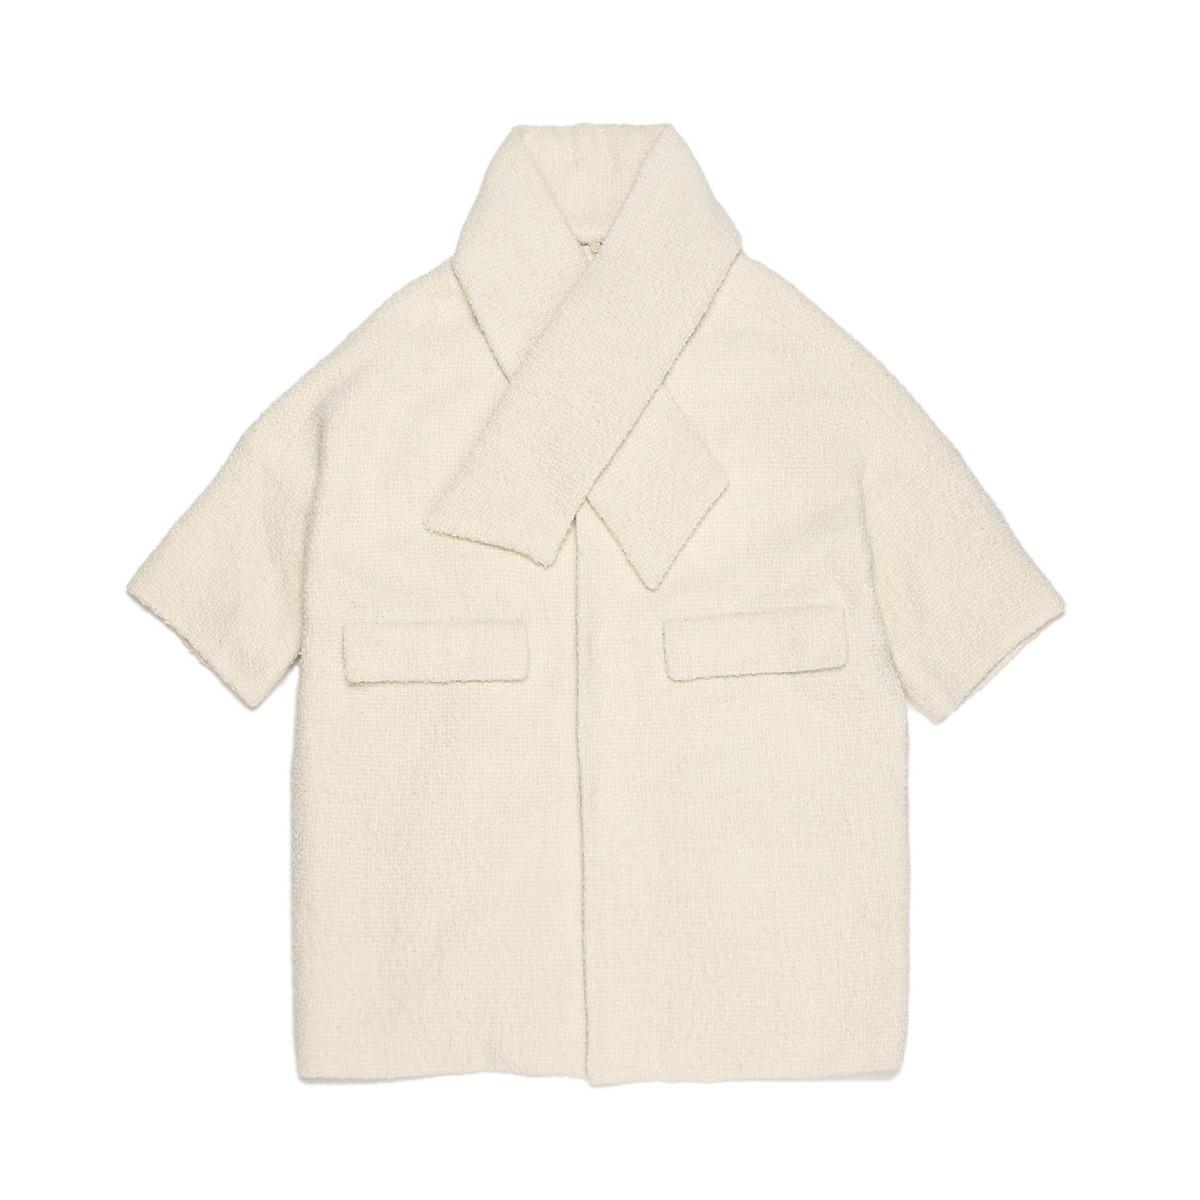 b+ab女款围脖领外套林允同款九分袖中长款外套BCXJK5O0153S5IVX